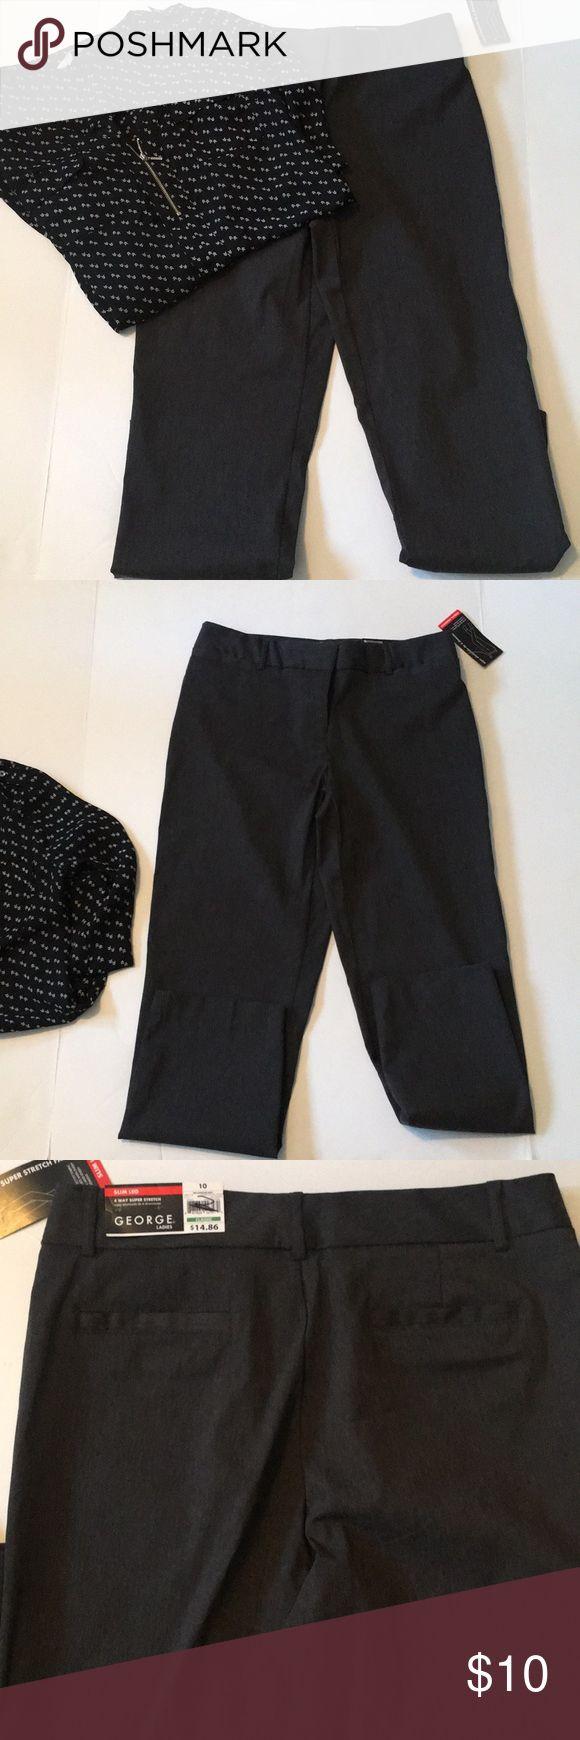 NWT George Slim Fit dress pants A slim leg 4 way Super Stretch career trouser. Nice Grey color! George Pants Skinny